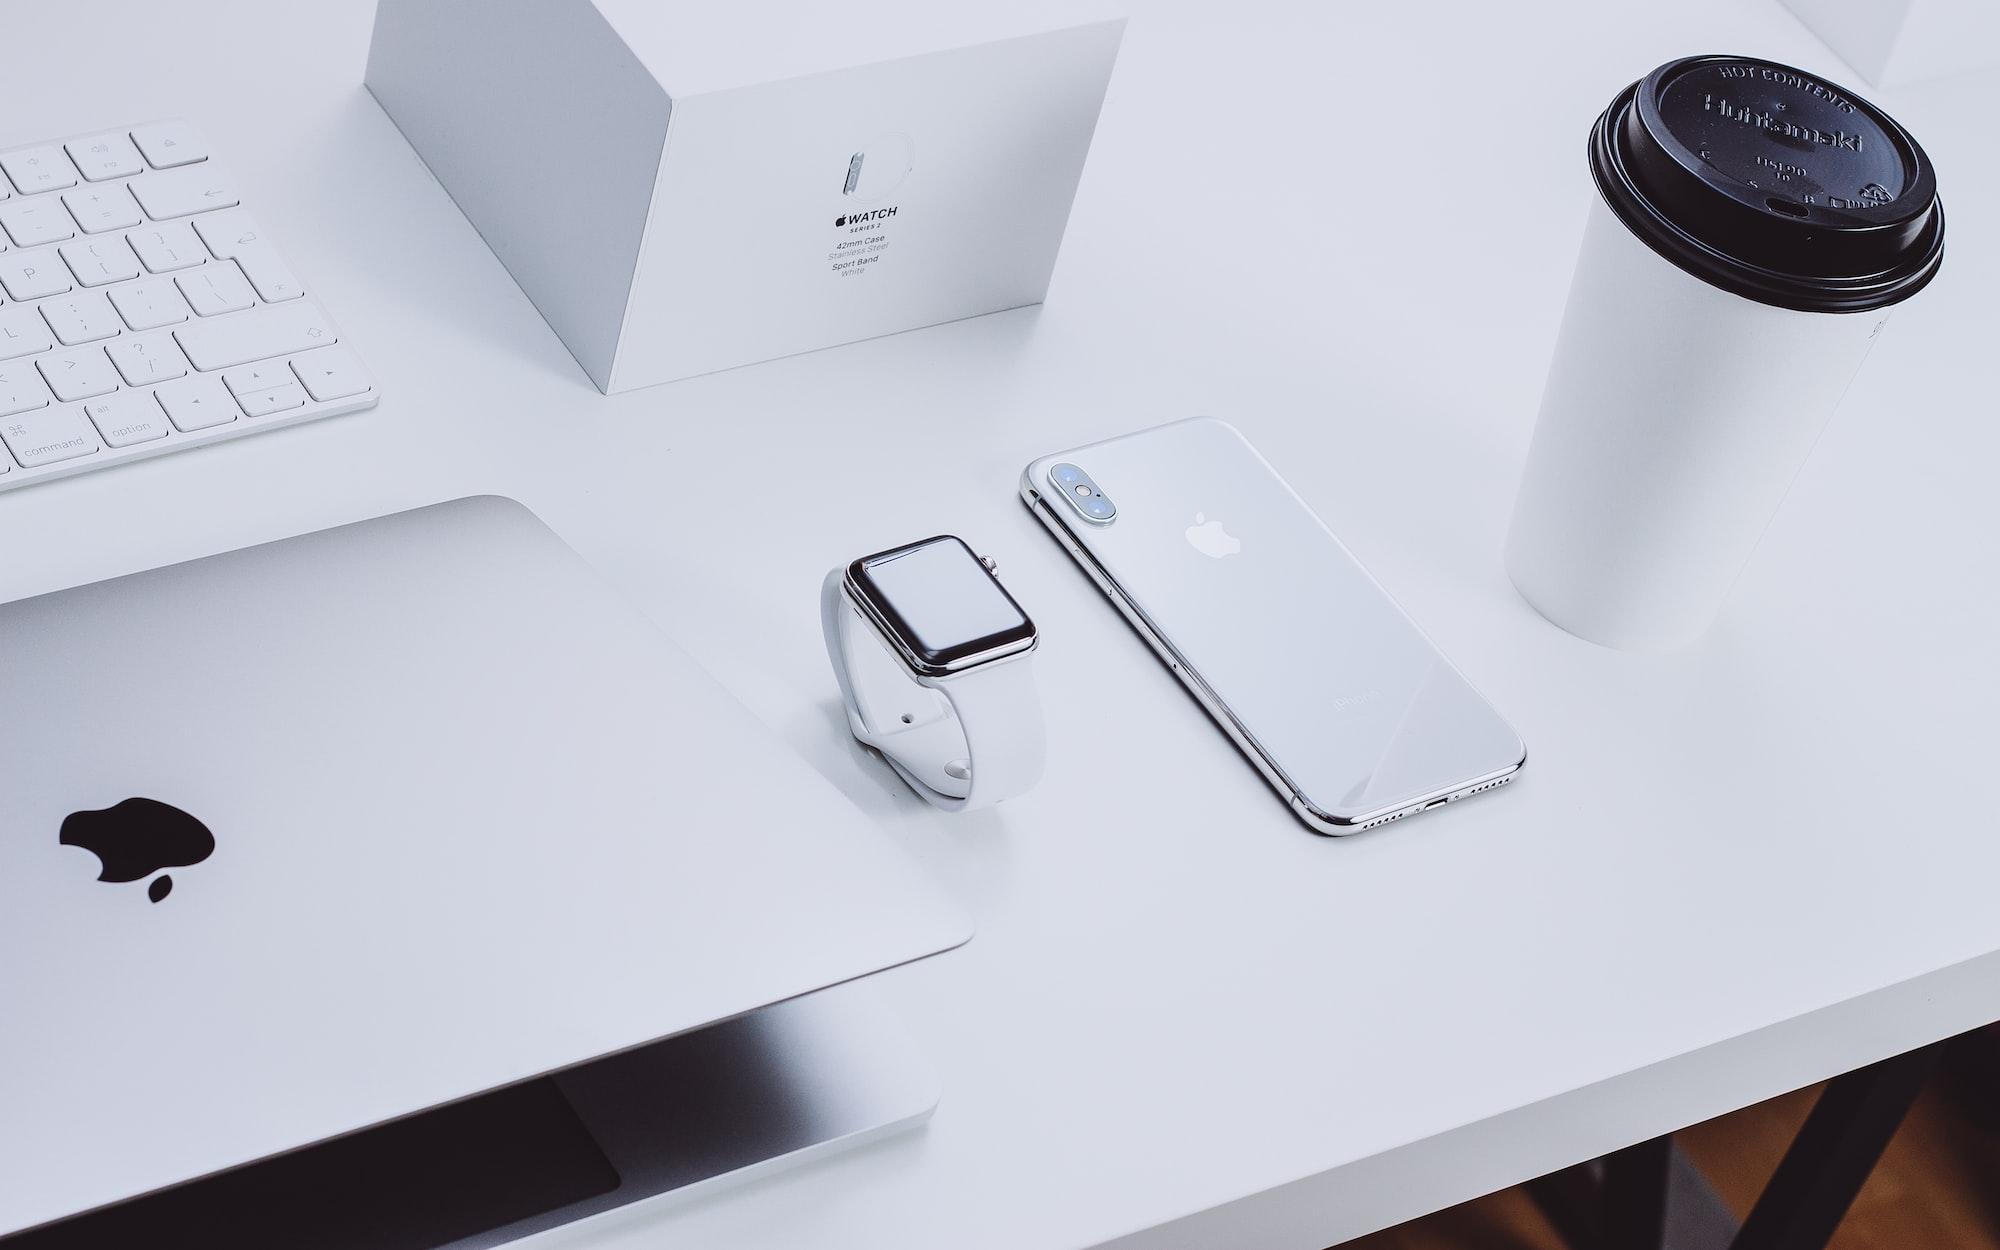 Apple Needs to Abandon Its Image Scanning Tech